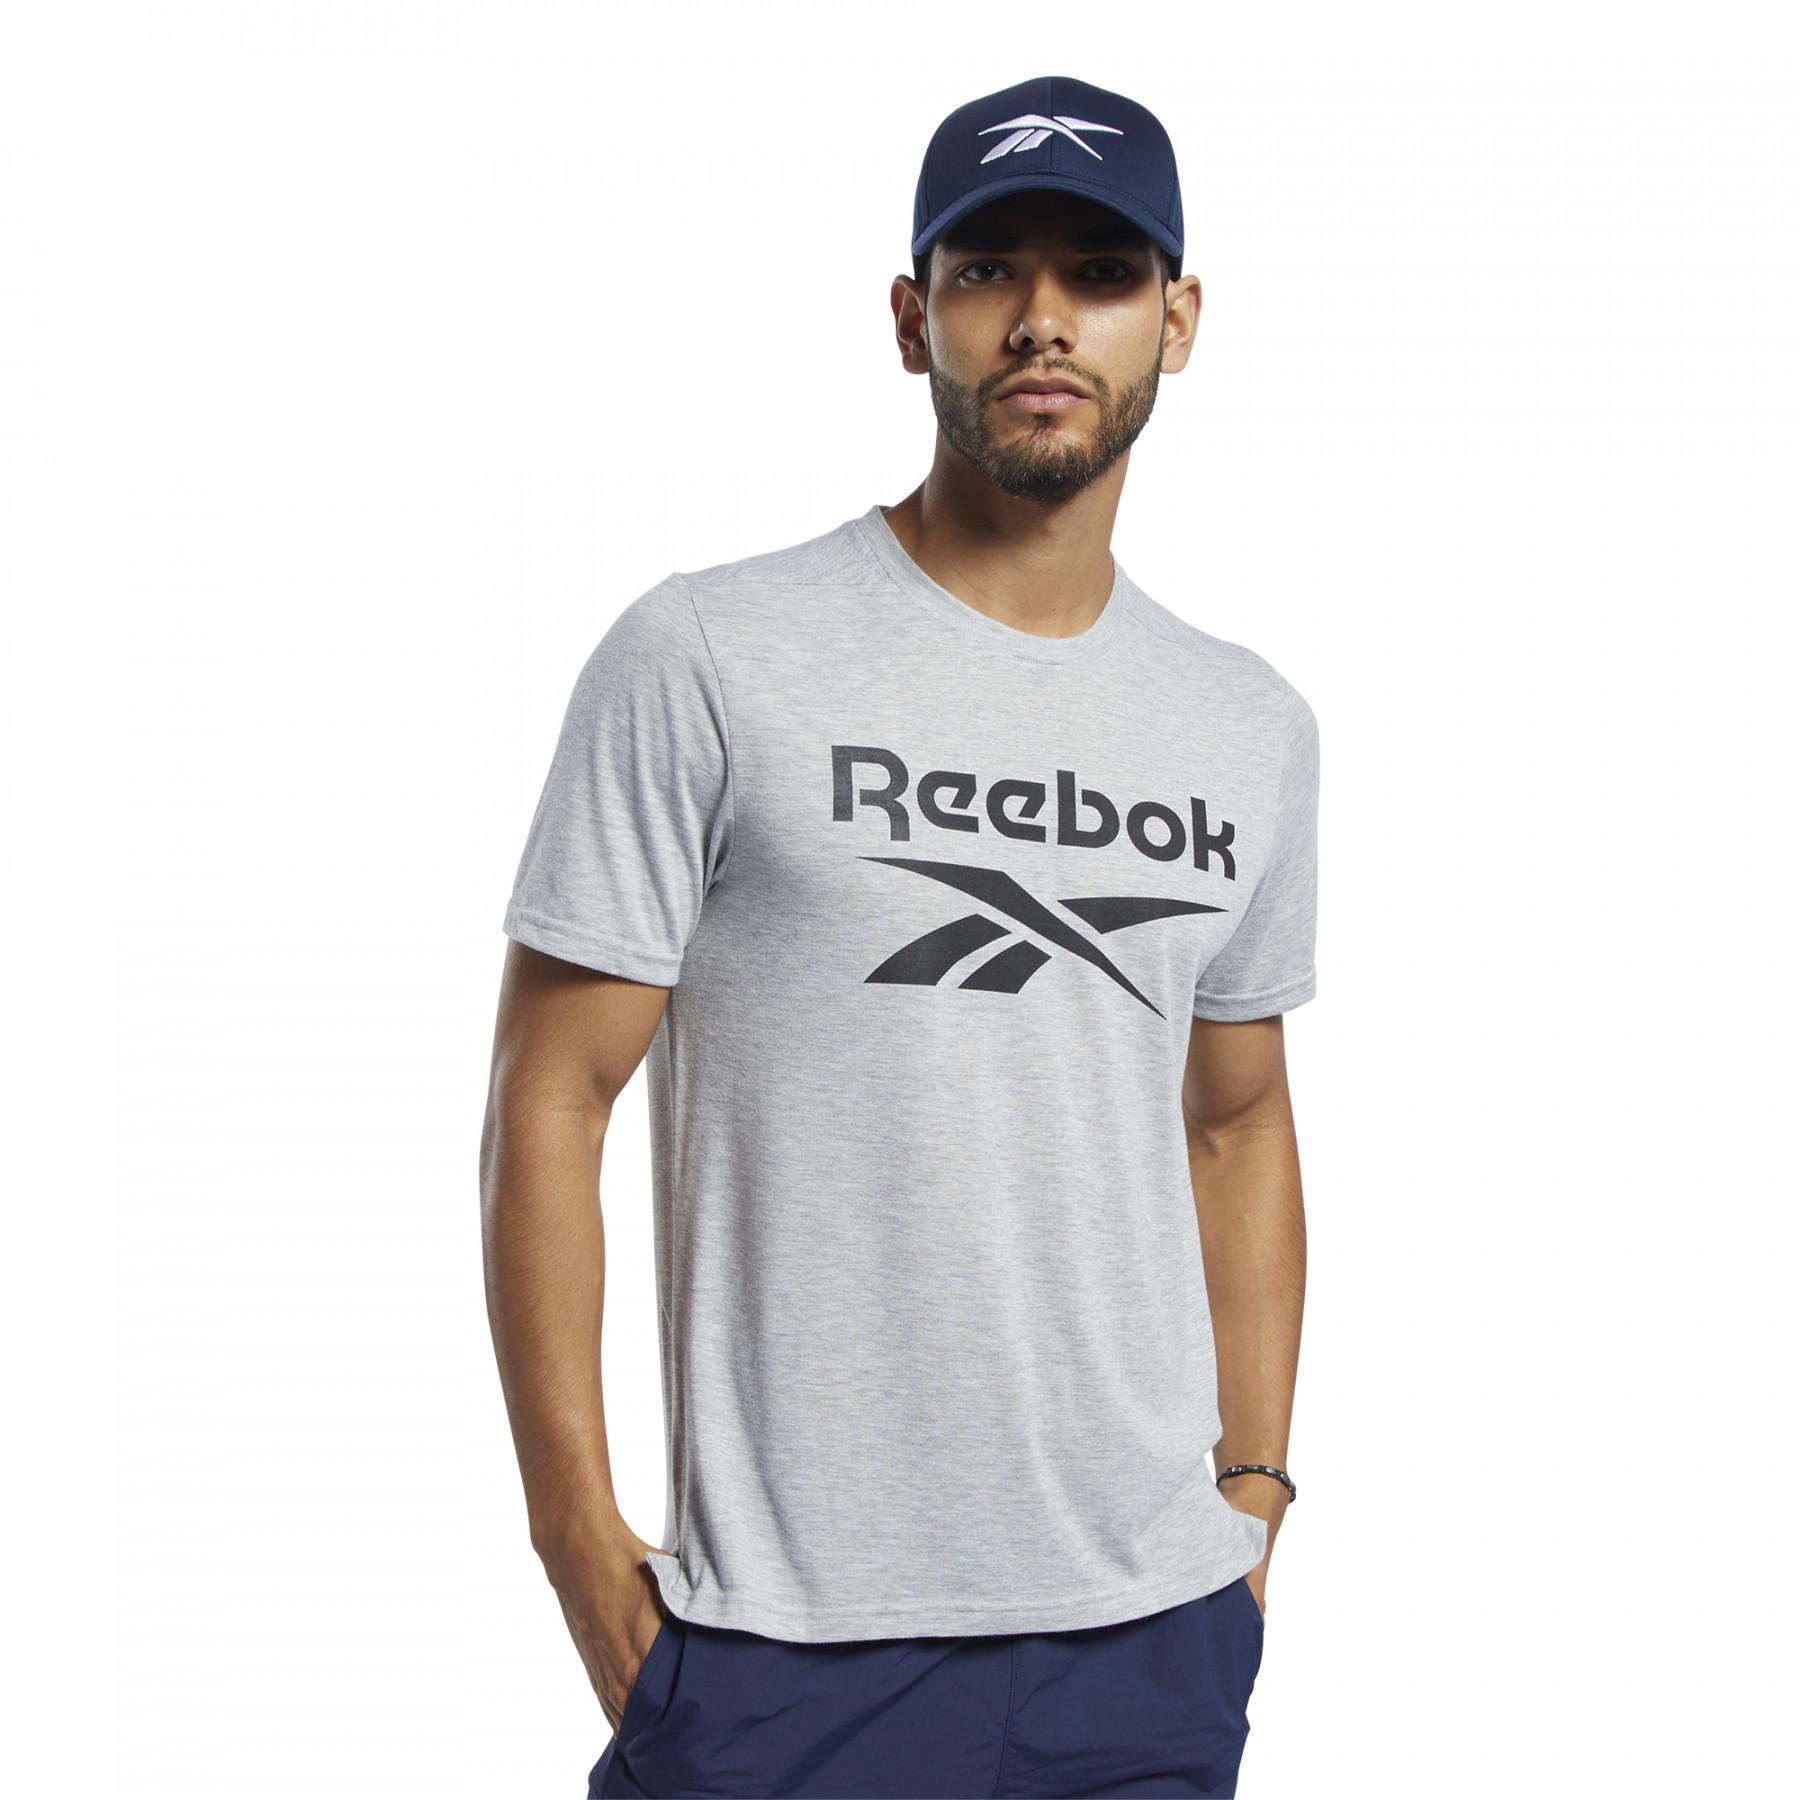 Reebok Workout Ready Supremium Graphic T-Shirt